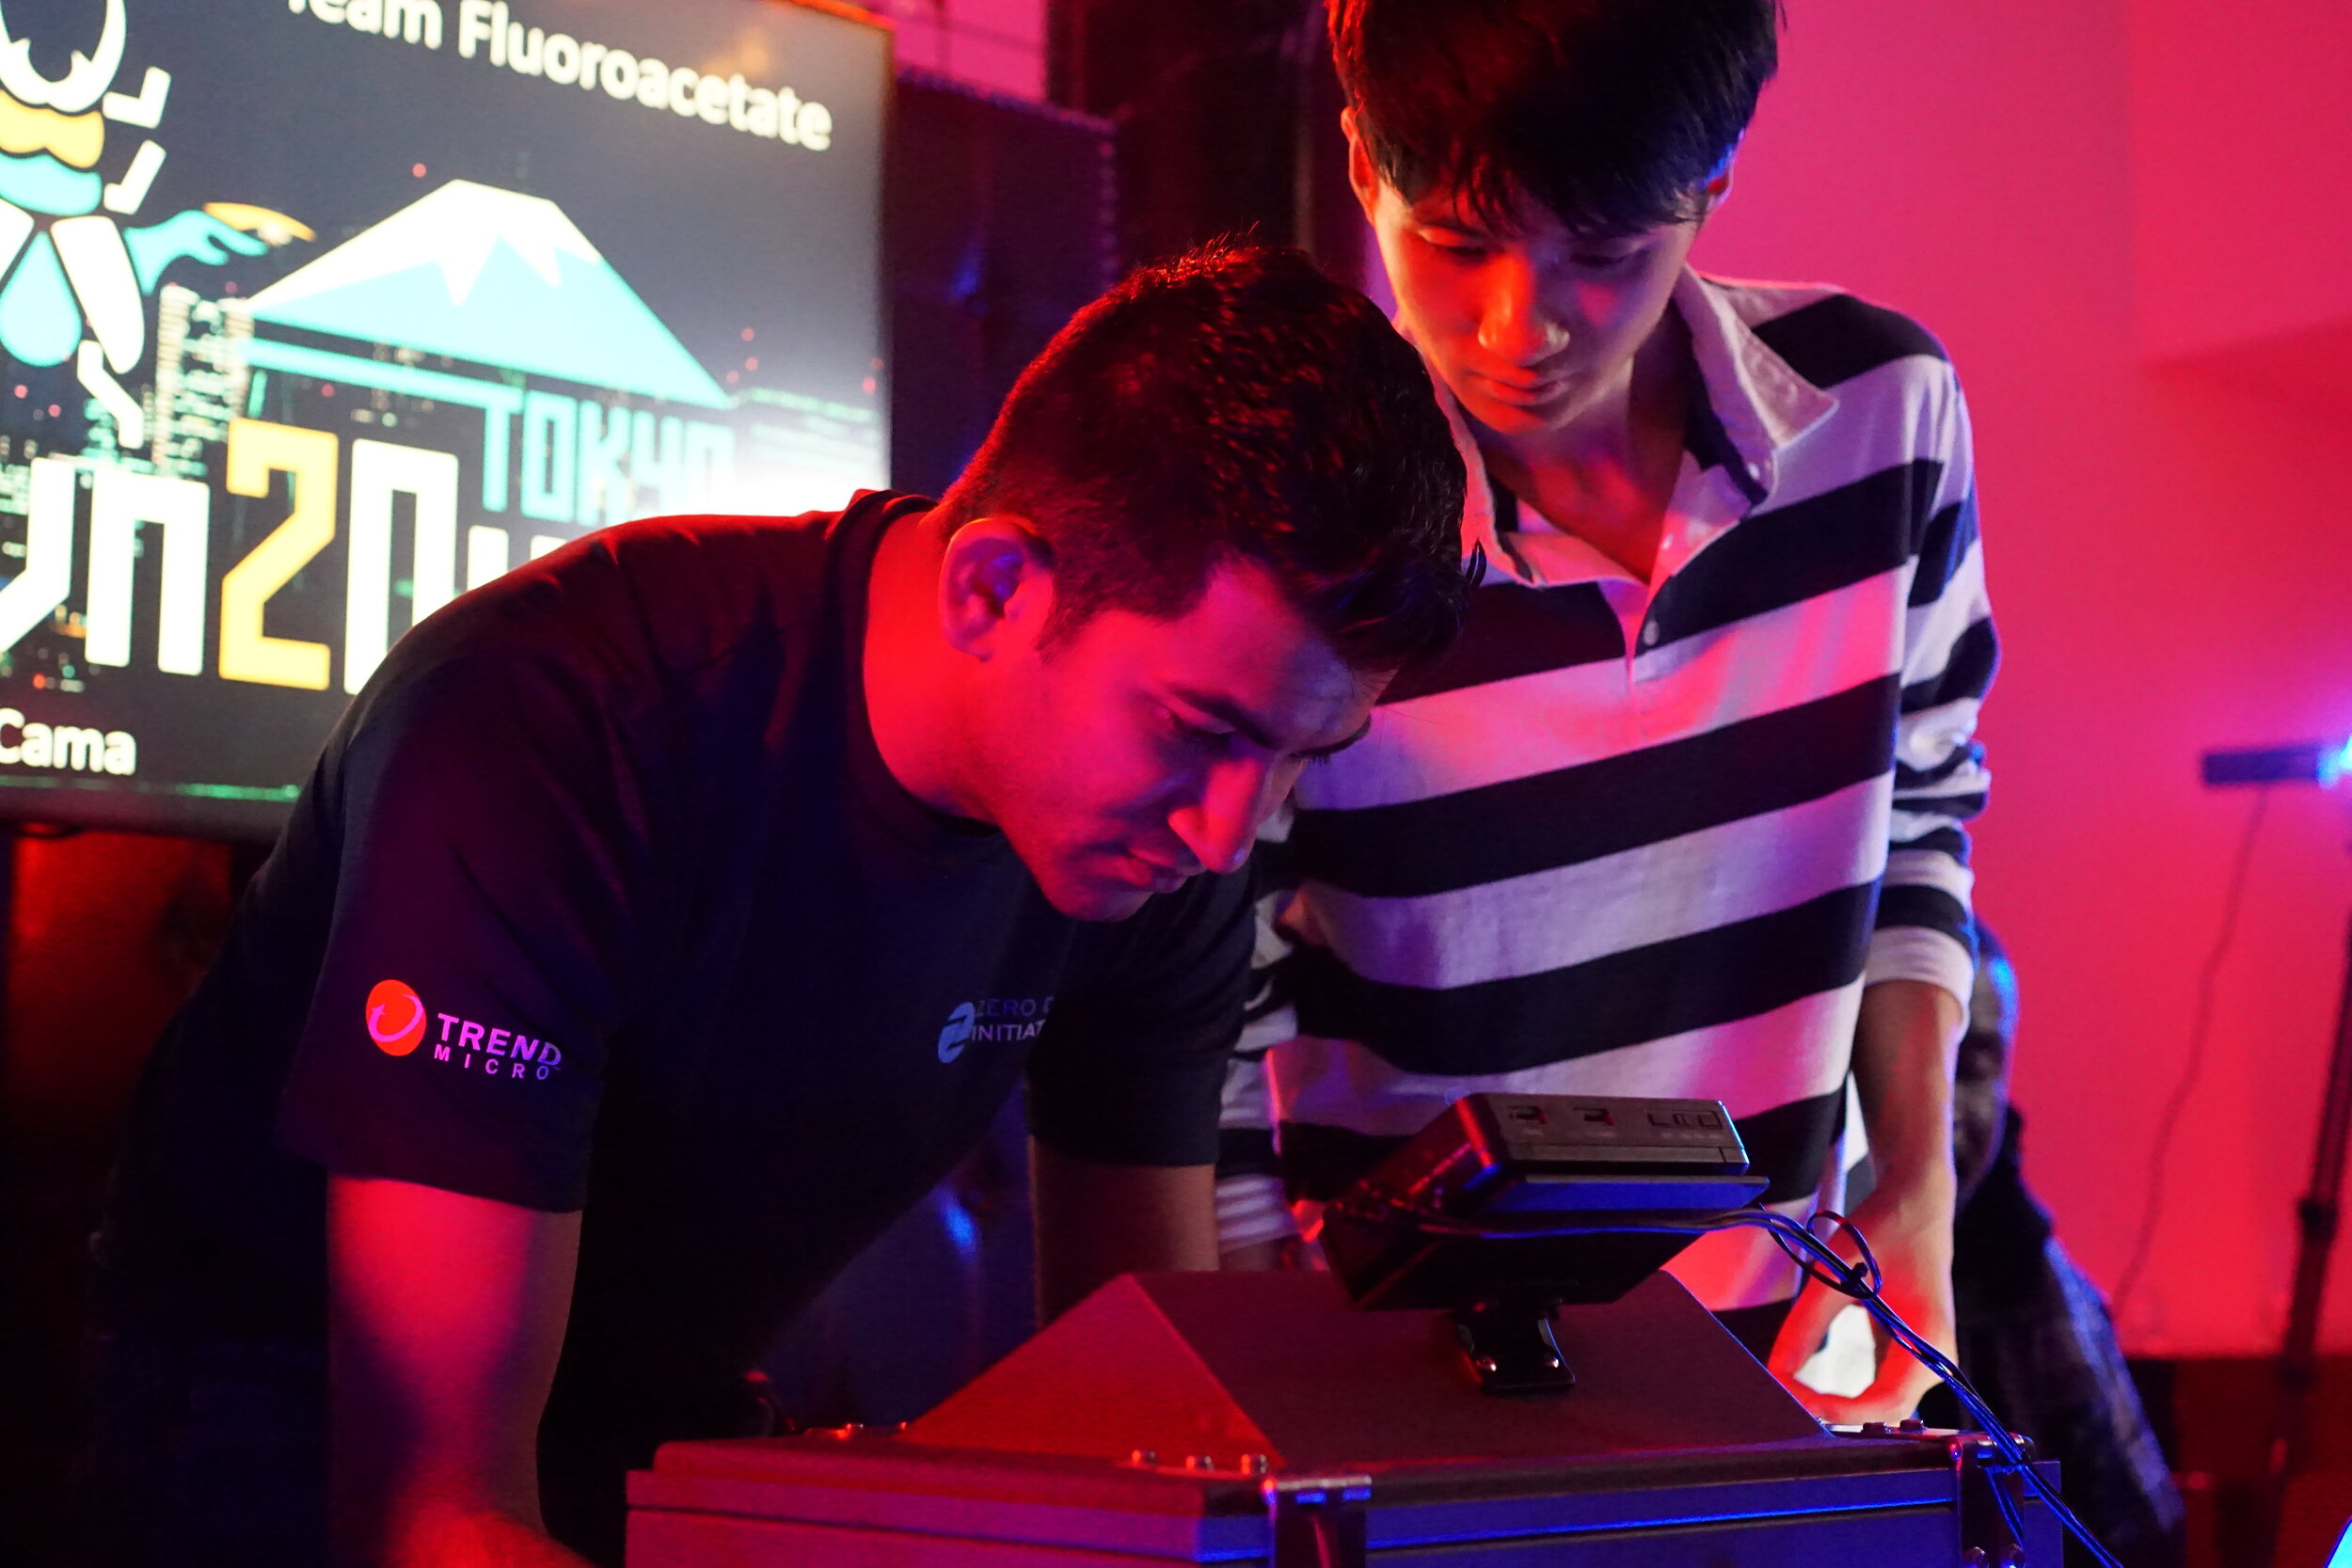 ZDI's Jasiel Spelman and Richard Zhu of Fluoroacetate